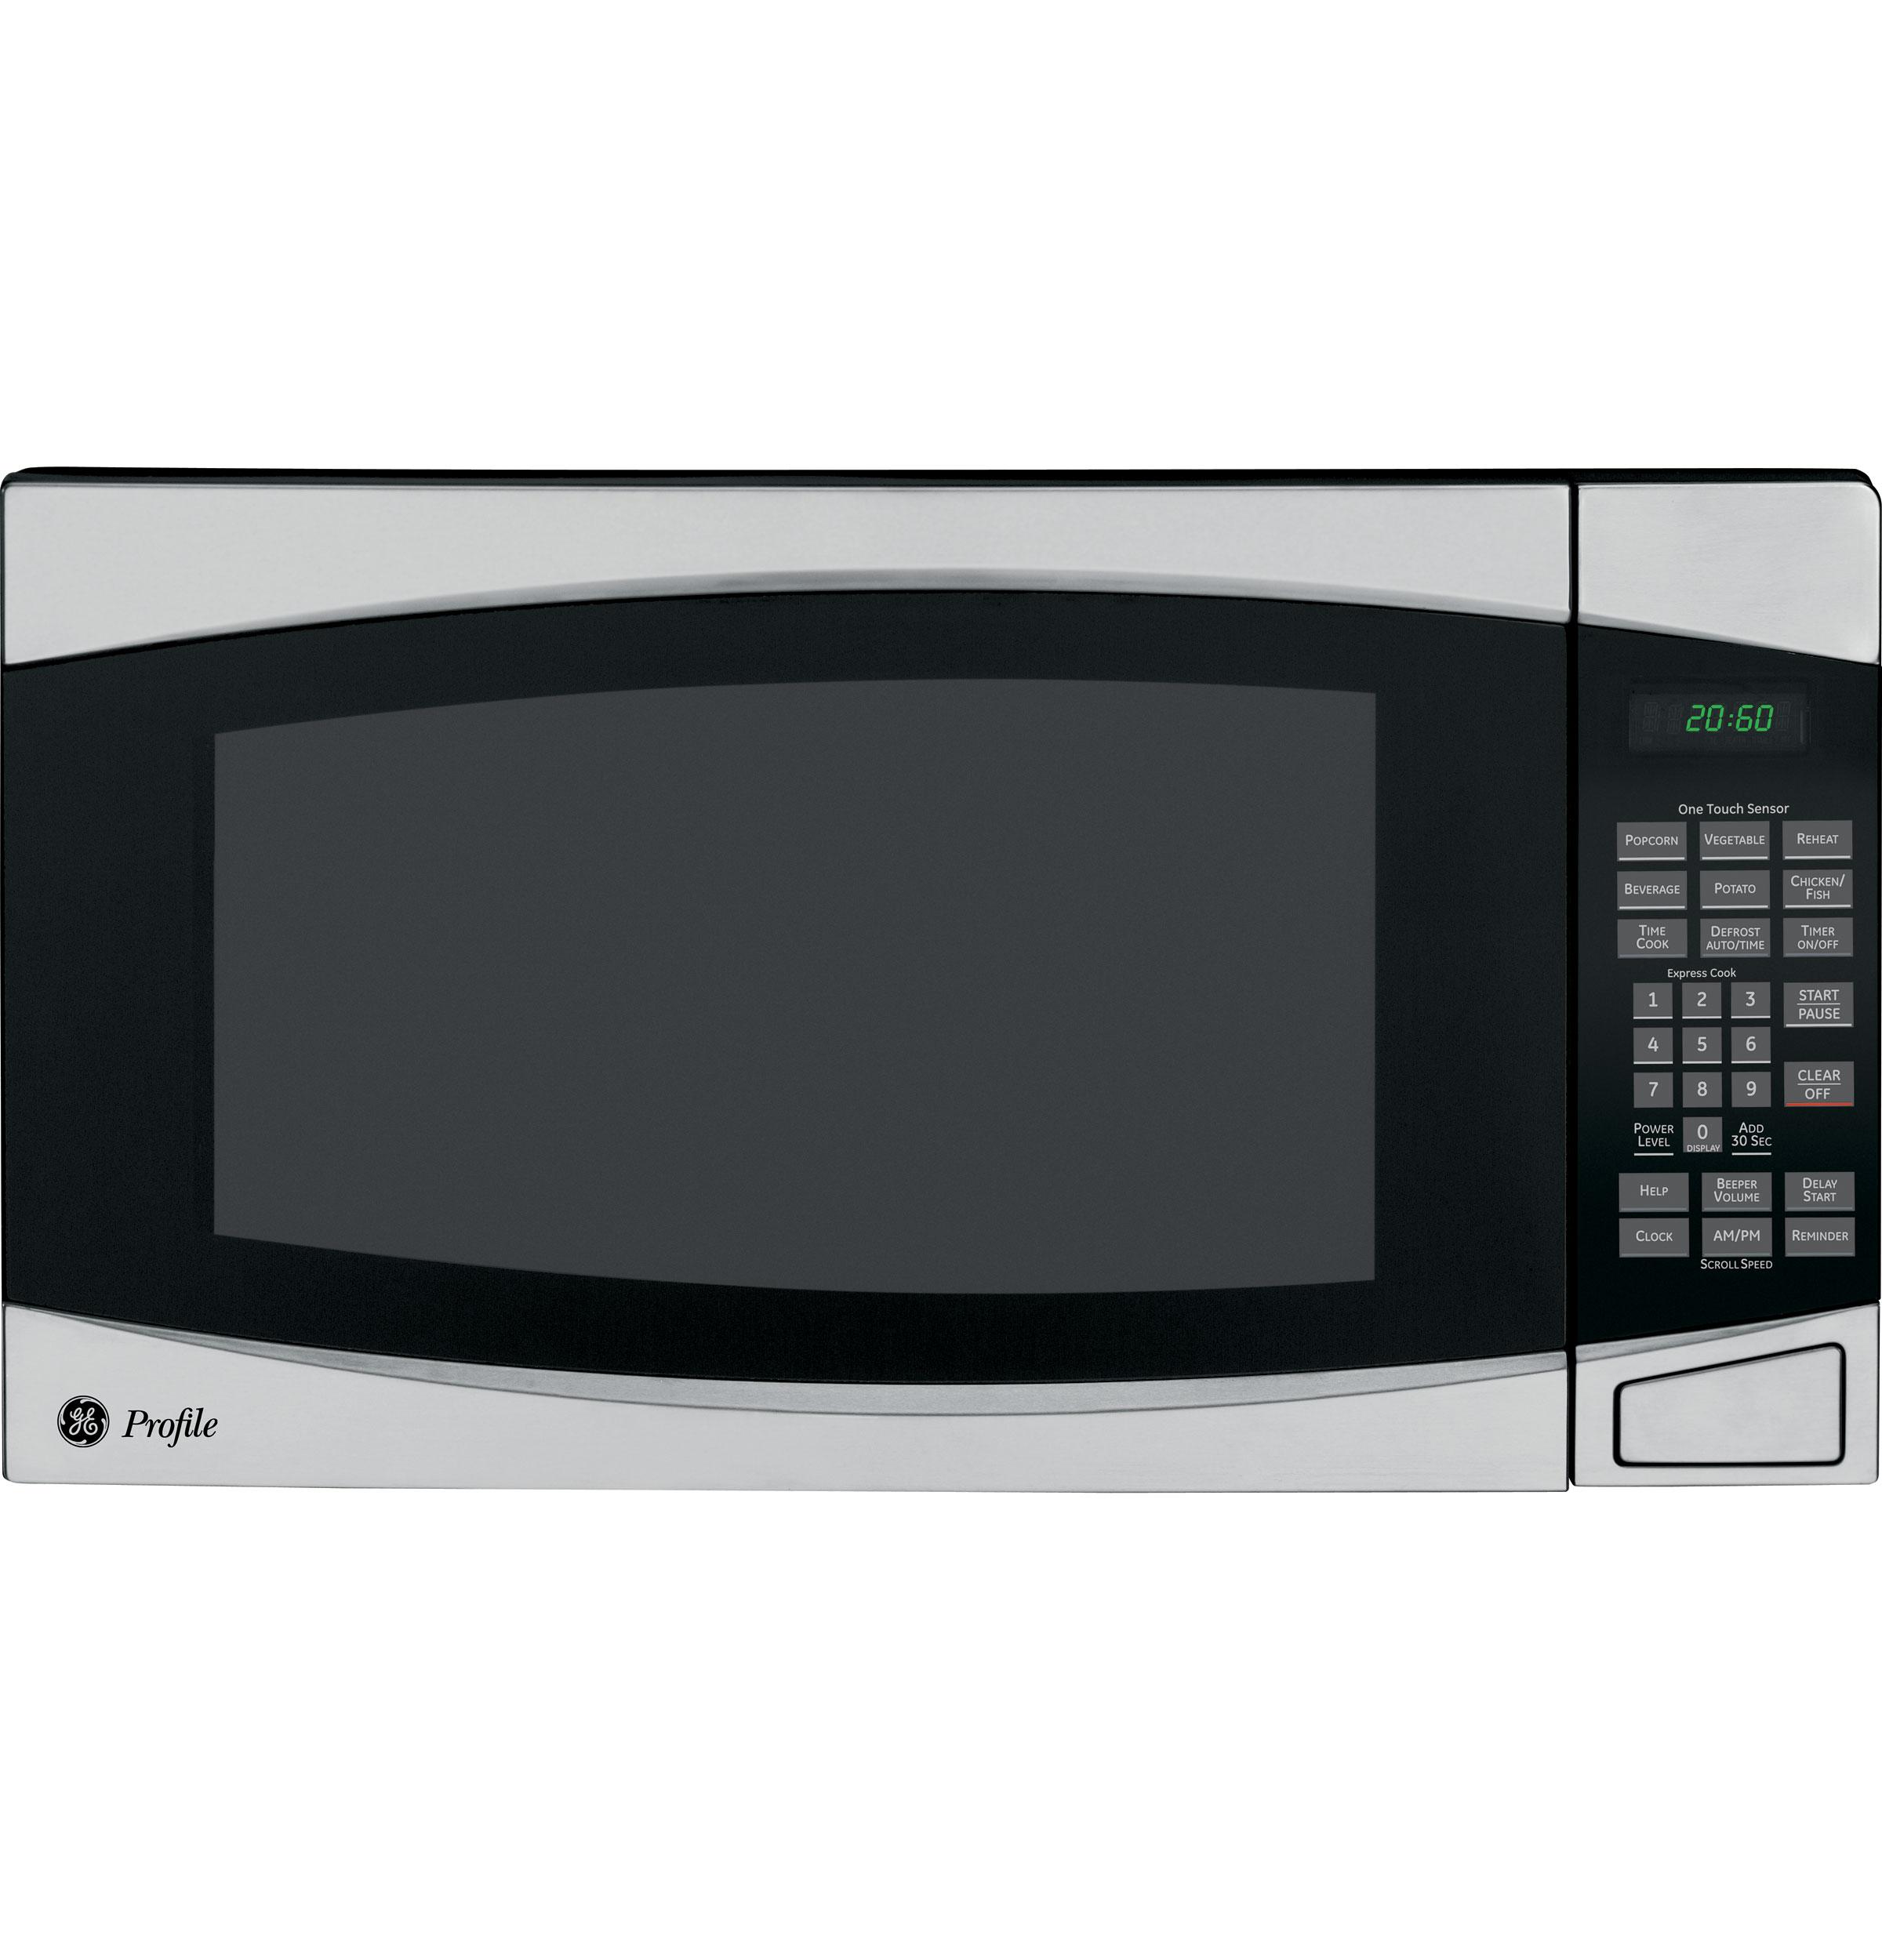 2 0 cu ft countertop microwave oven